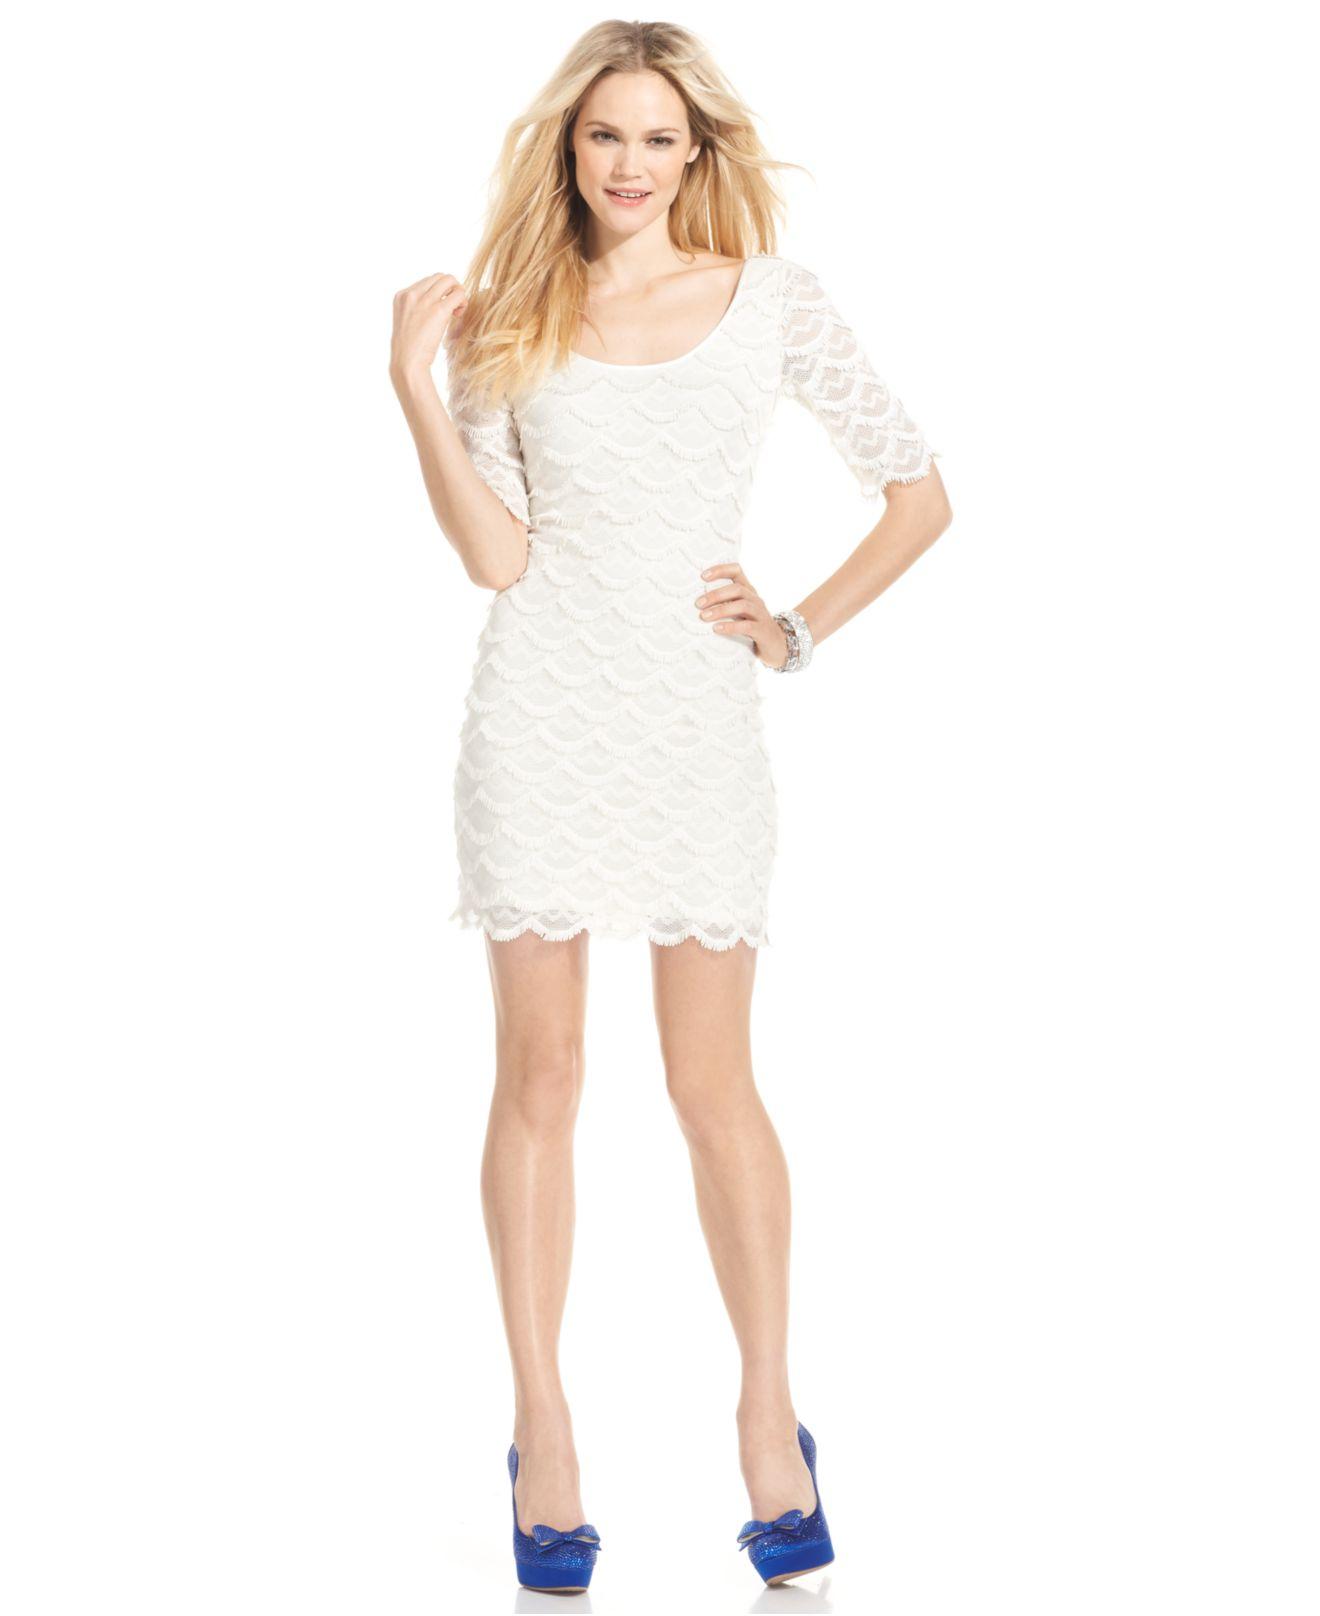 Short White Lace Dress Macys